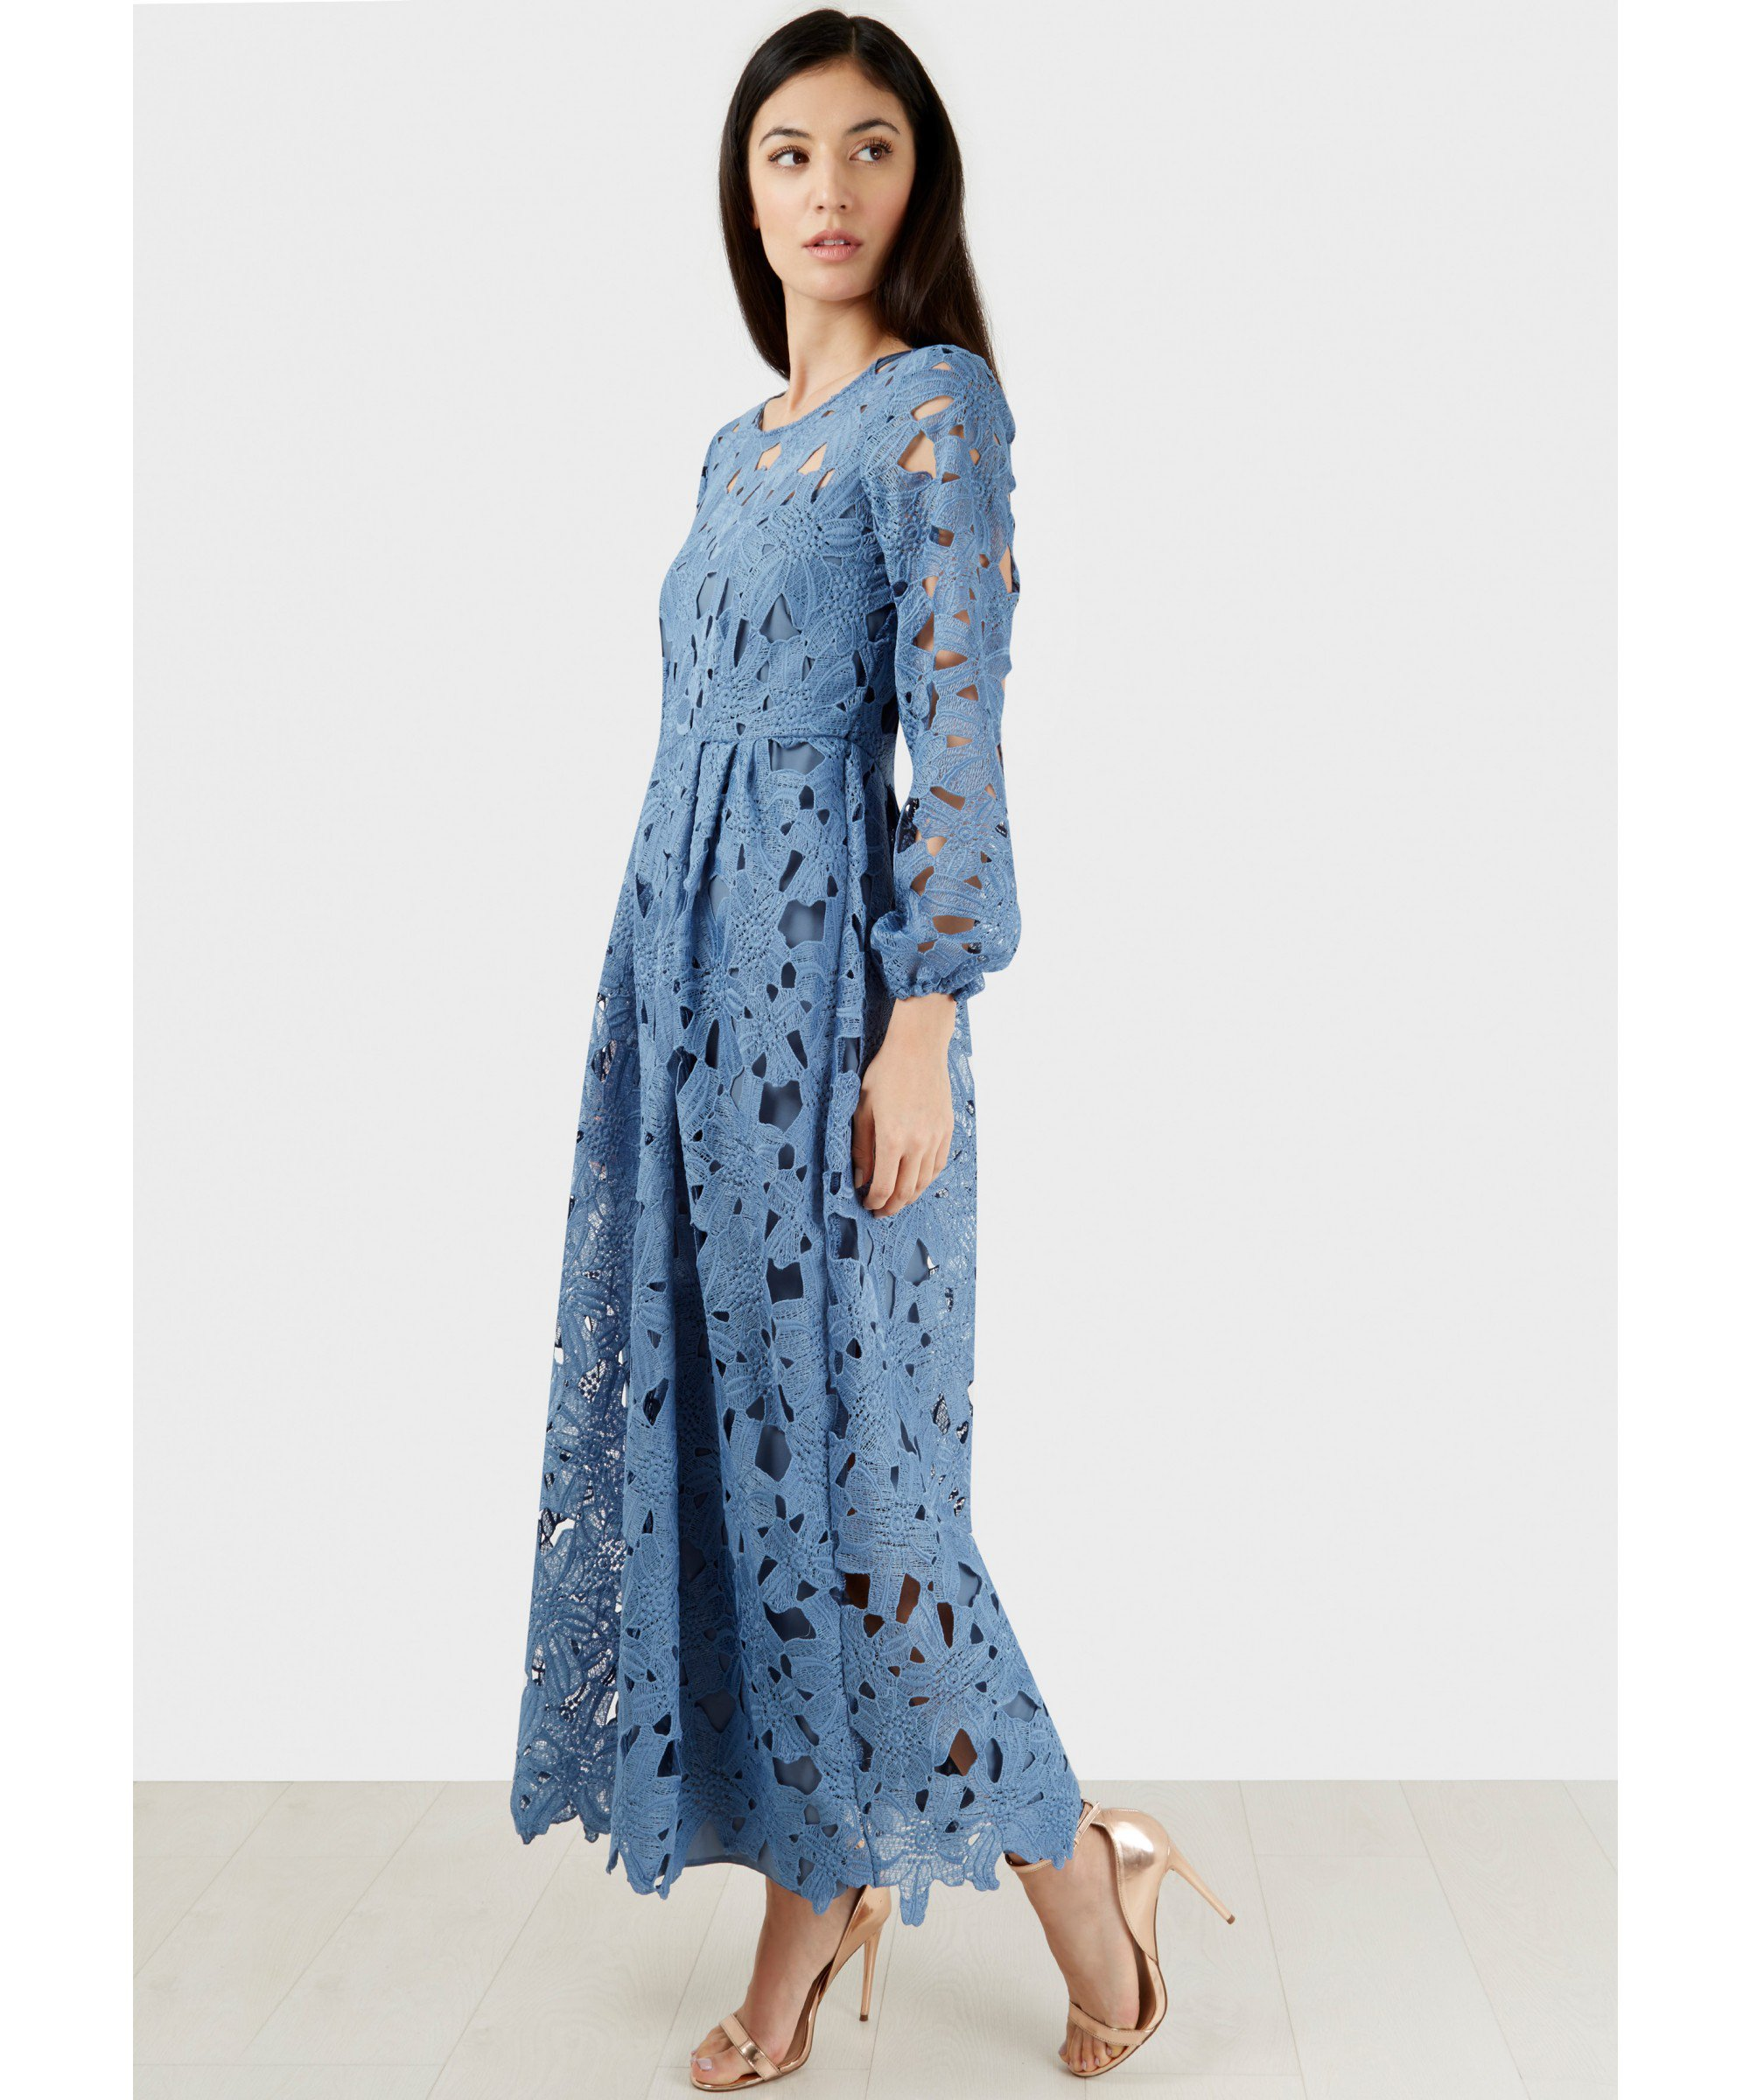 Full sleeve maxi dress uk